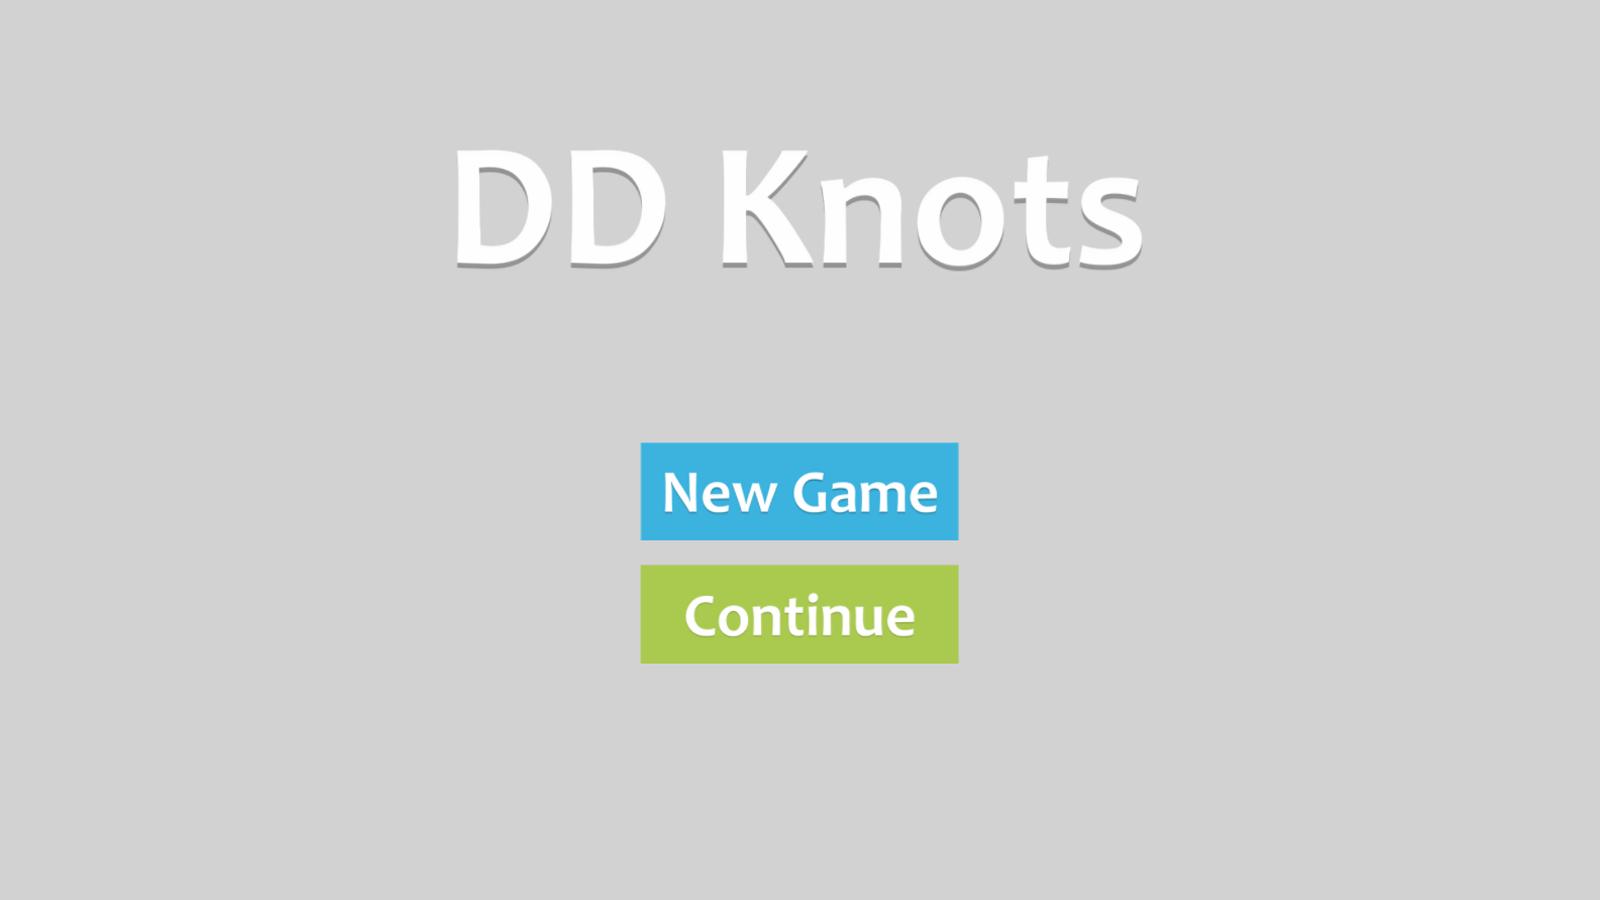 Knots Game Welcome Screenshot.